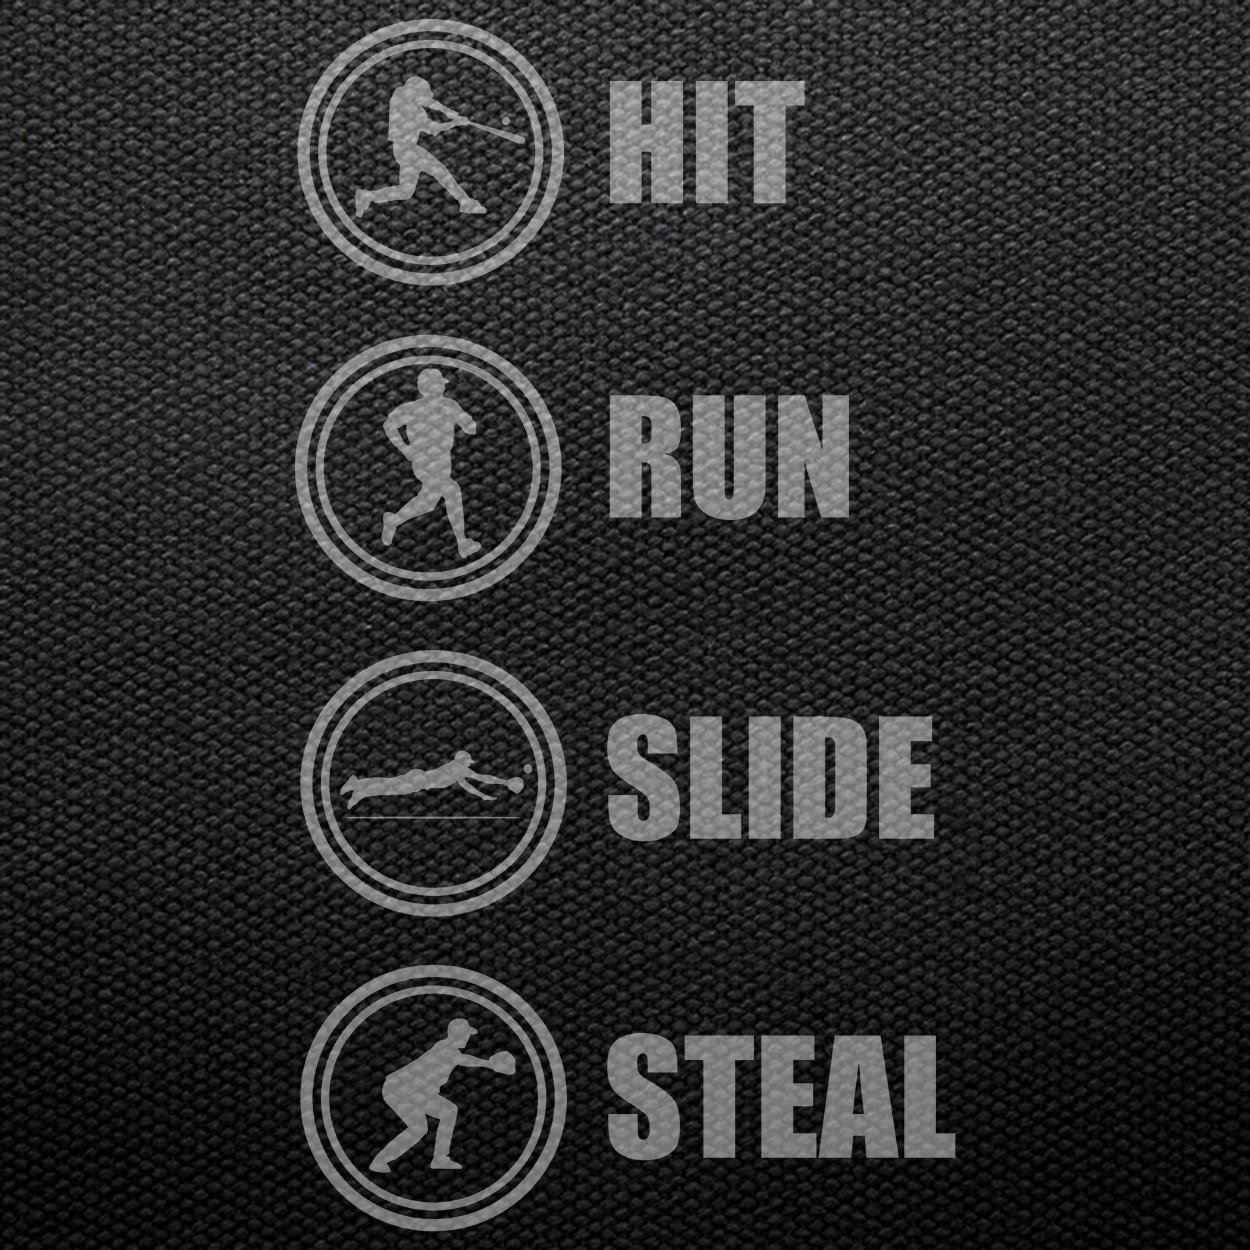 Teechopchop Hit Run Slide Steal,Baseball Lovers Gift Players Referee COA Tank Top